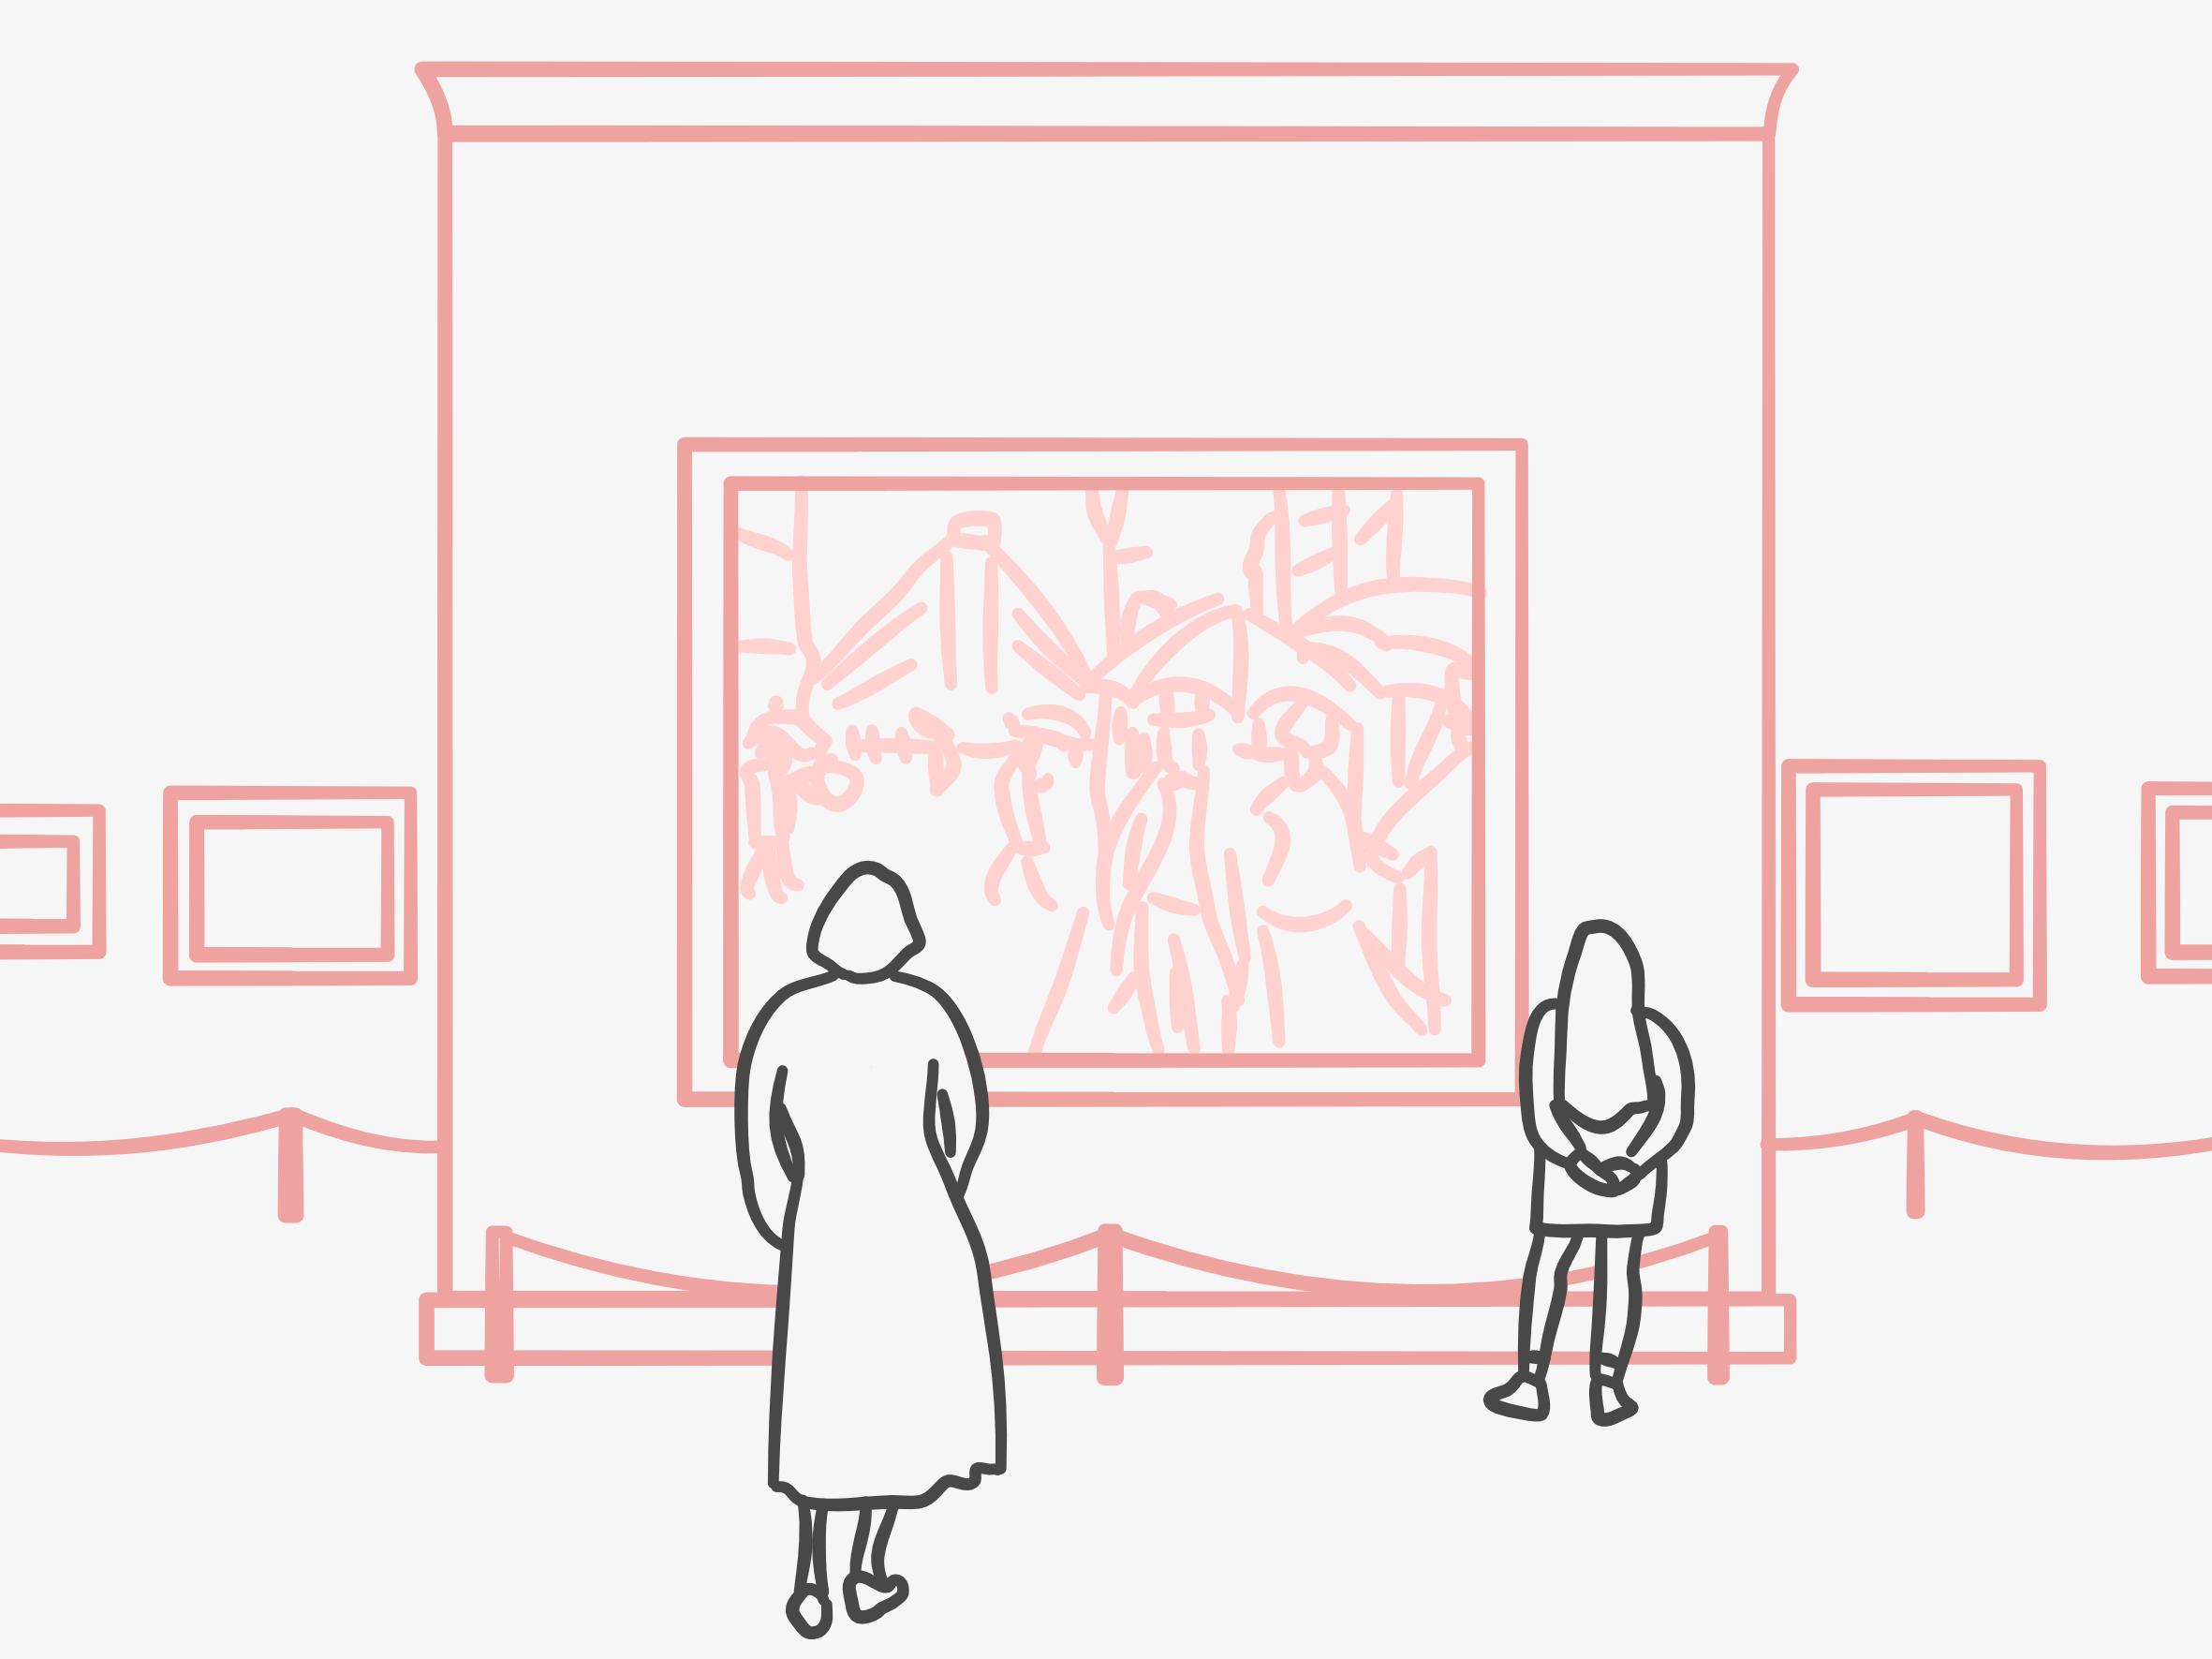 The joy of slowing down in art galleries